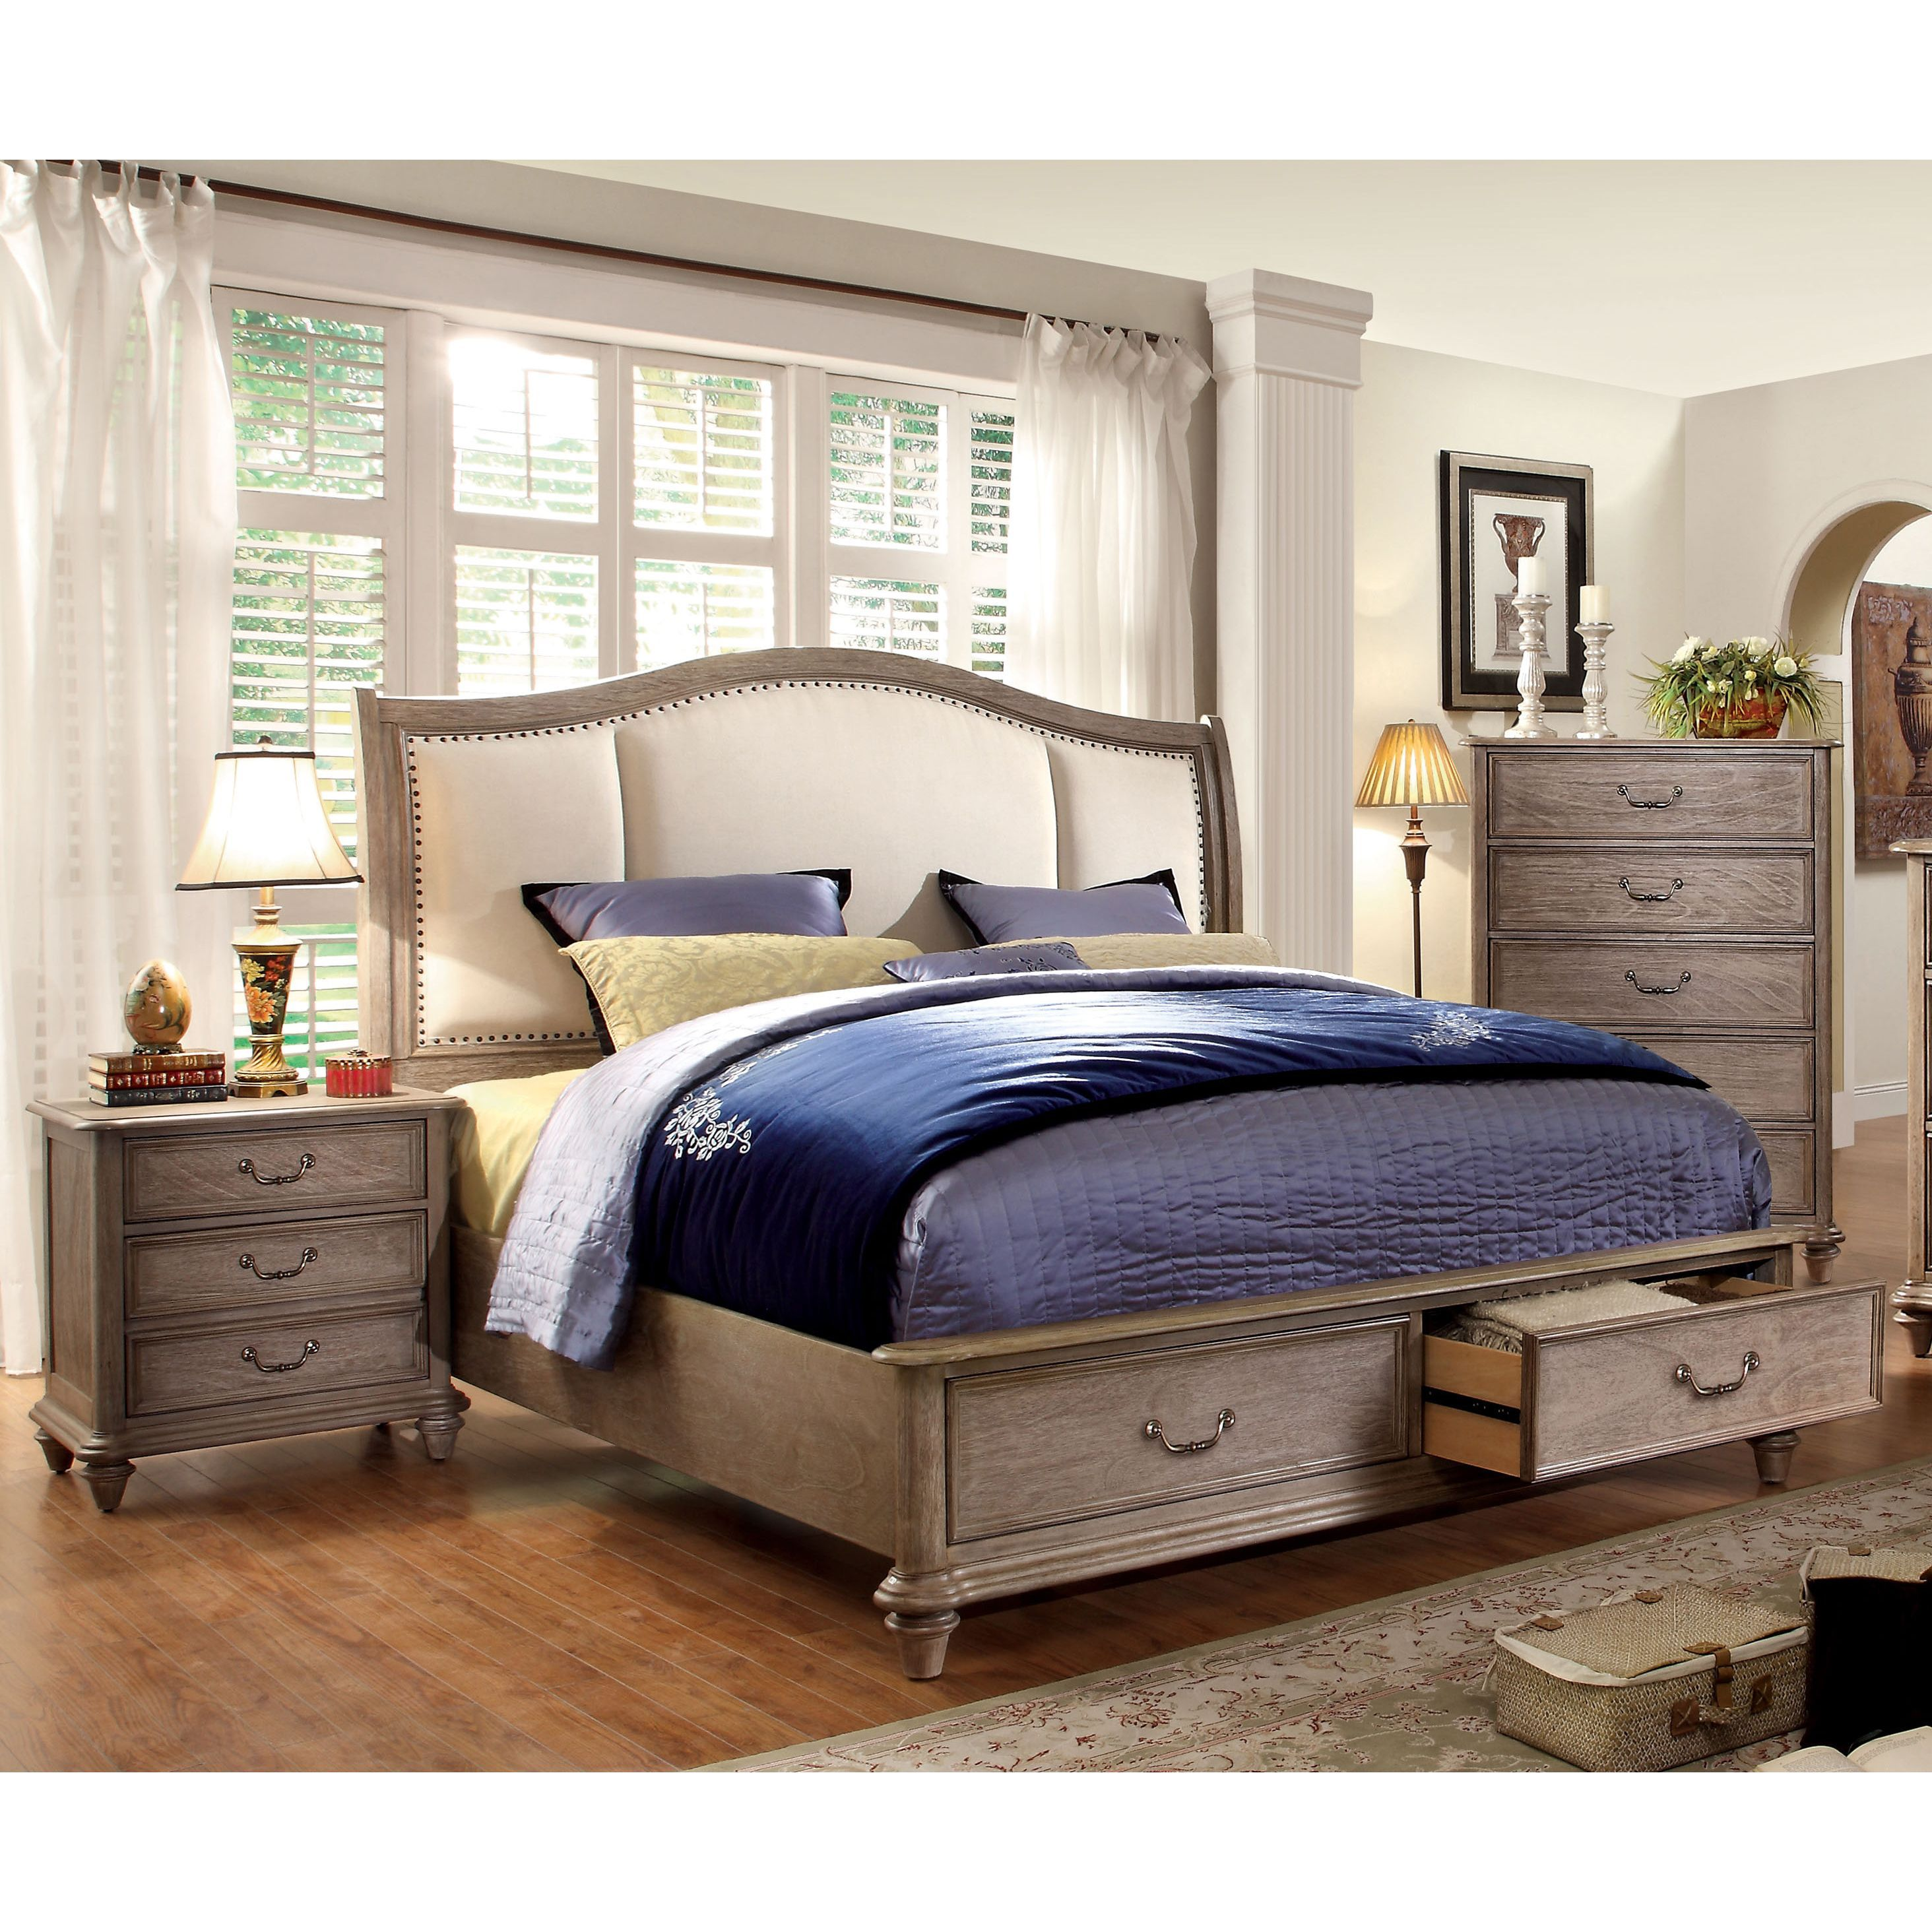 Best Furniture Of America Minka Iv Rustic Grey 3 Piece Bedroom 640 x 480